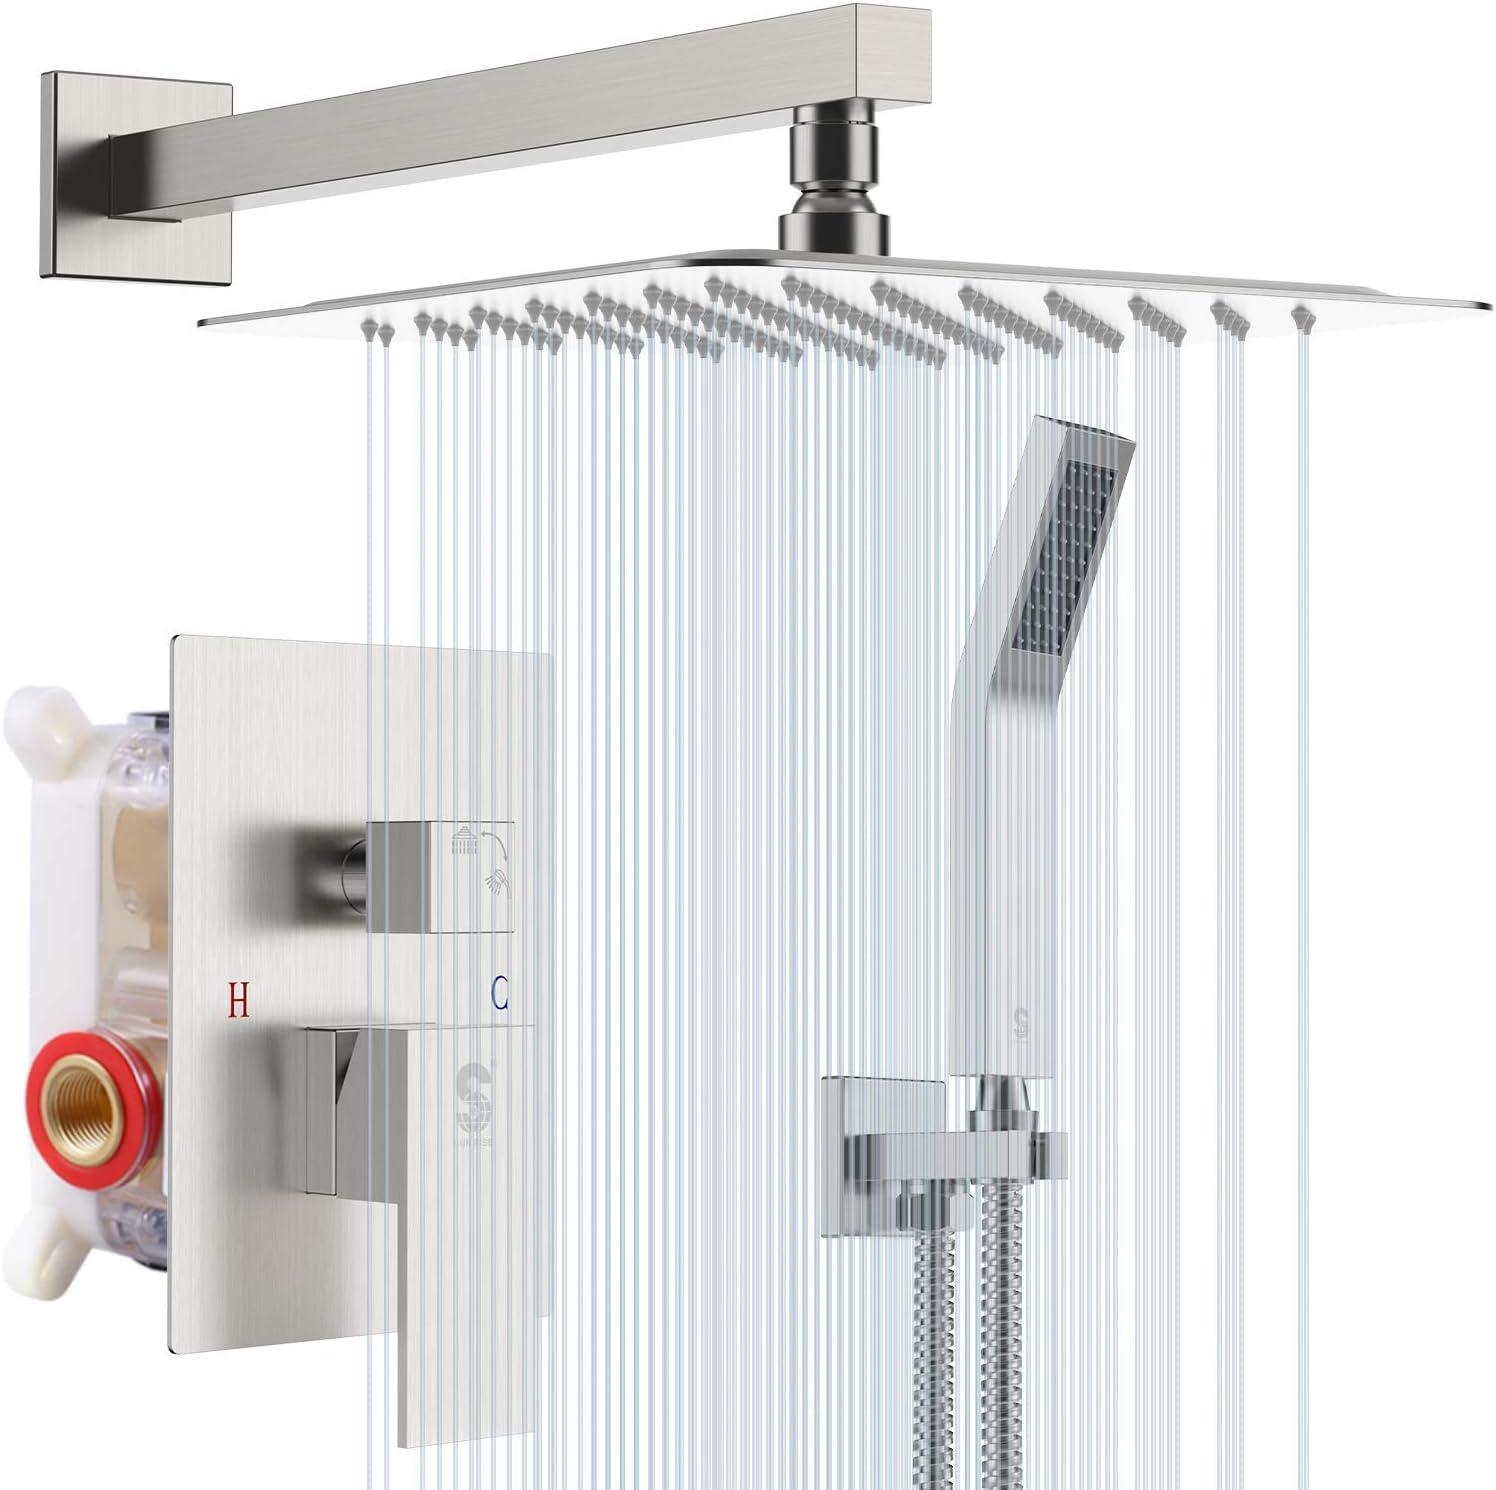 SR SUN RISE 12 Inches Bathroom Luxury Rain Mixer Shower Combo Set